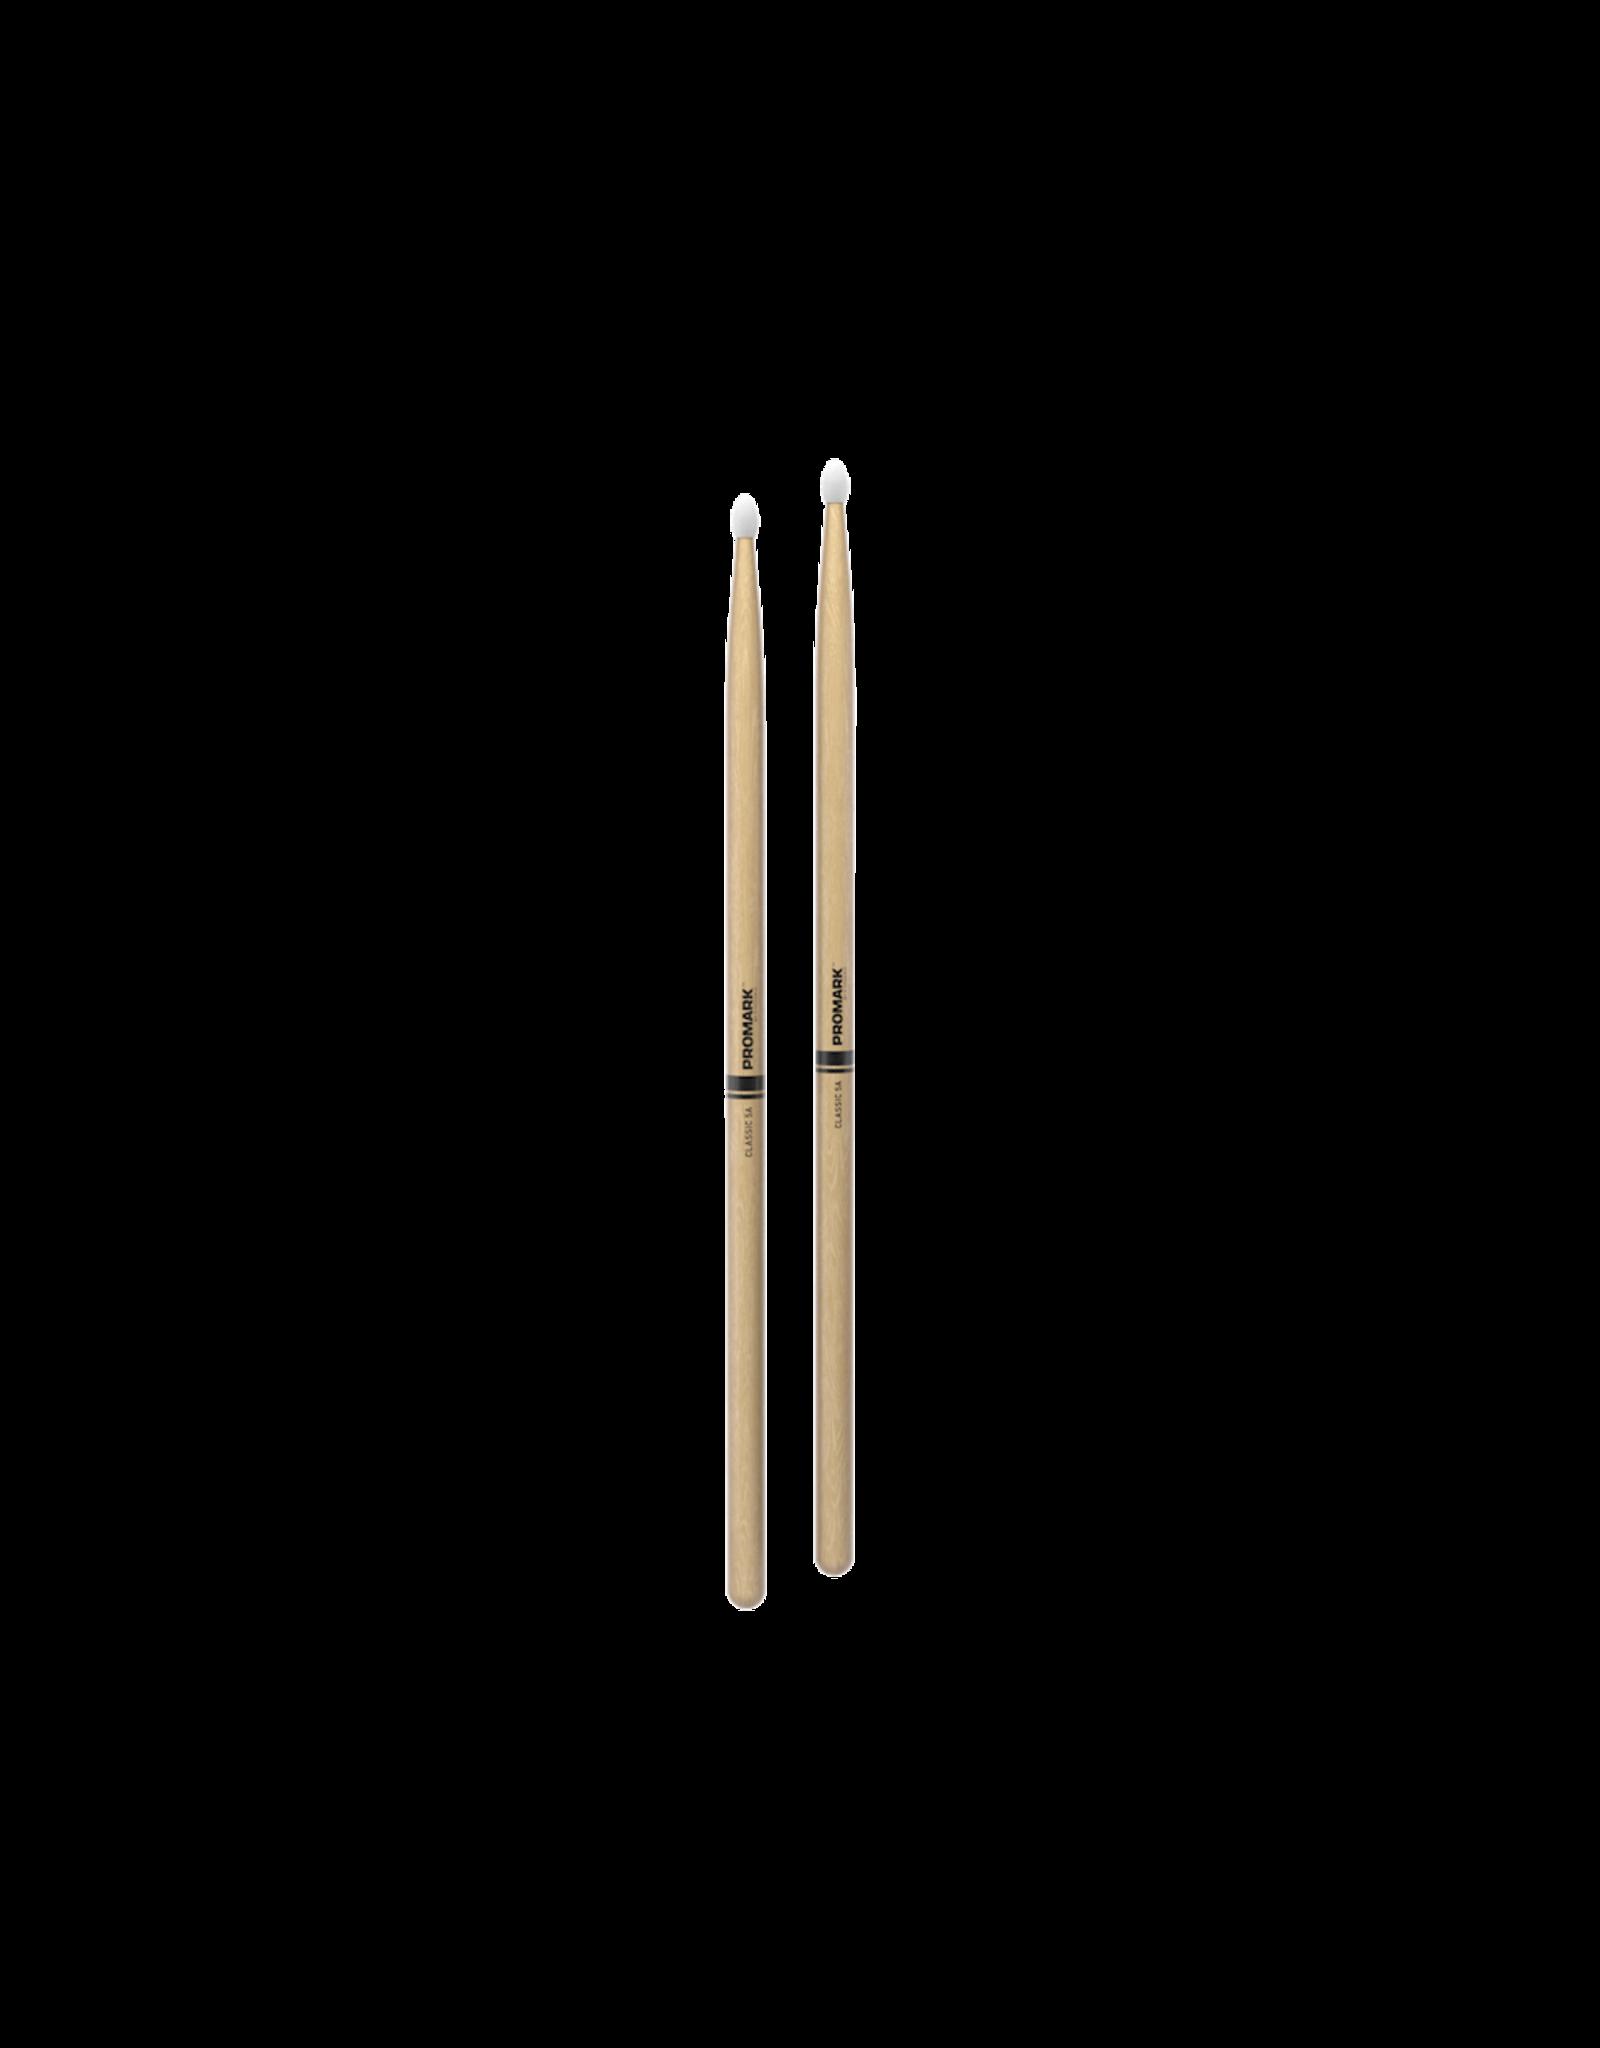 Promark Promark CLASSIC 5A Hickory Nylon Tip Drumstick